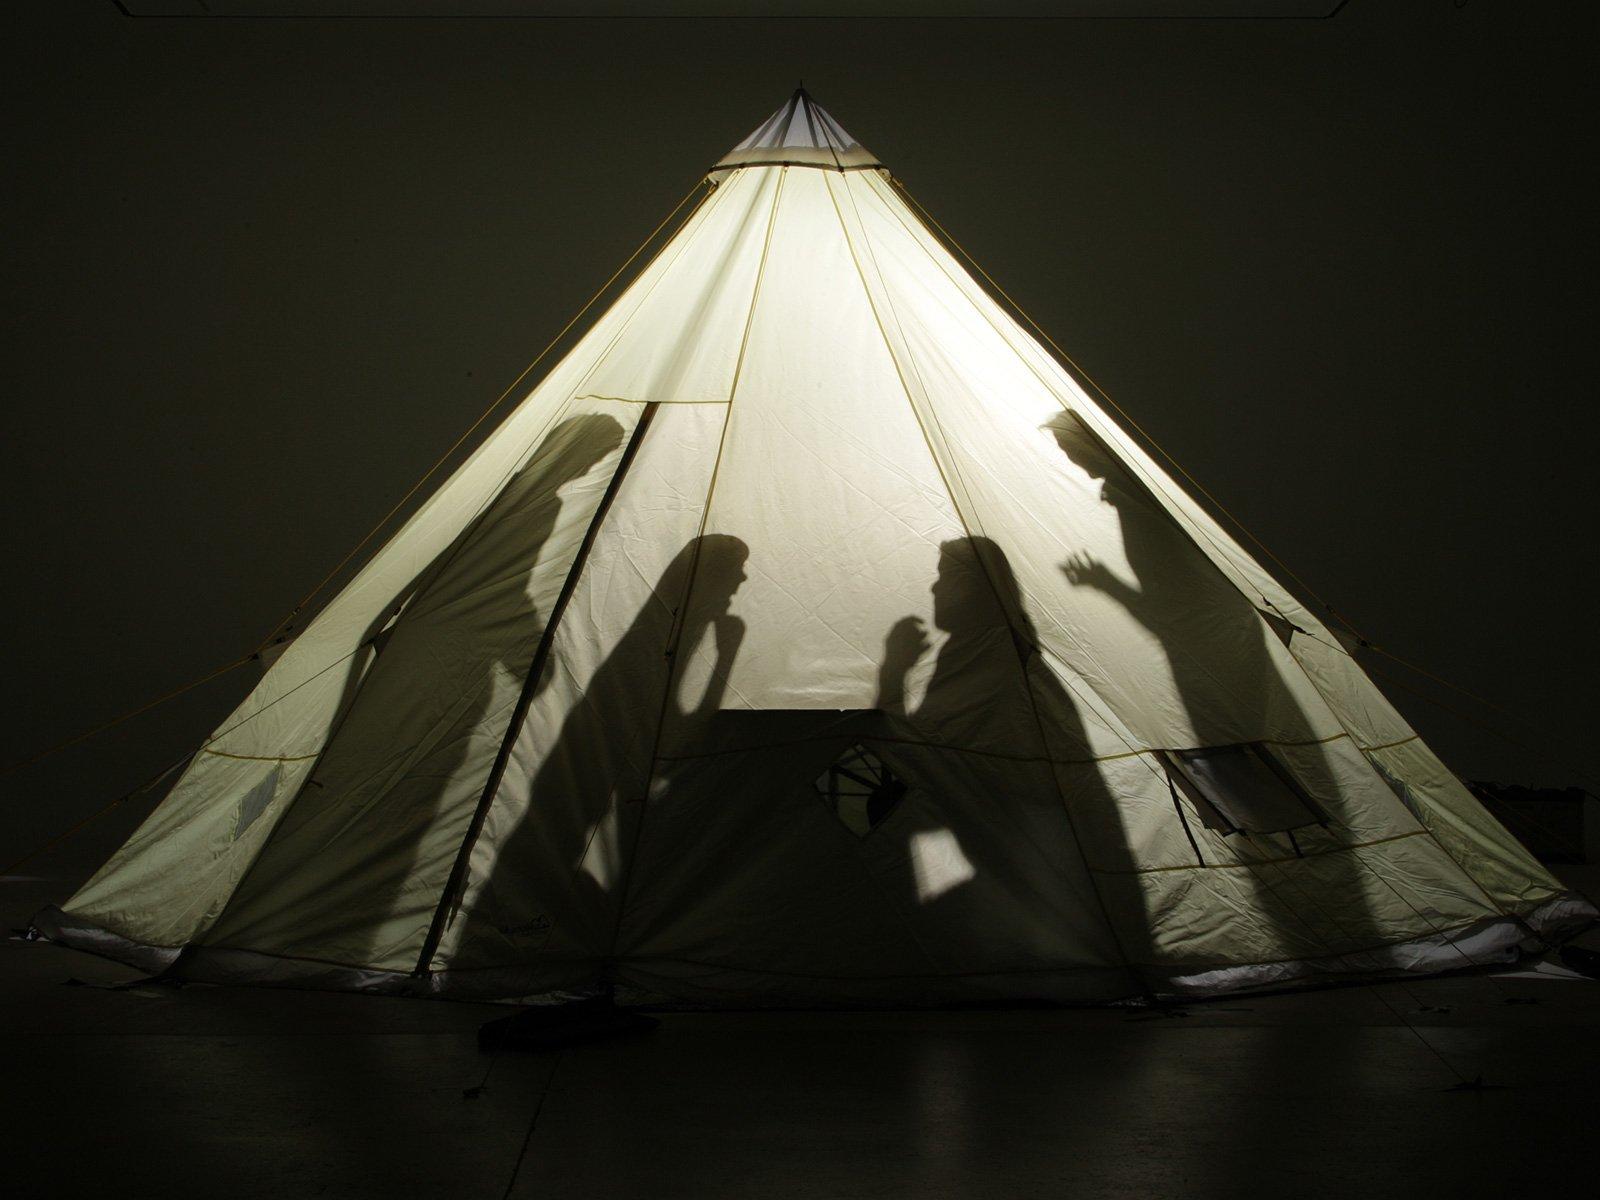 Skandika Teepee 301 Wigwam Style Indiana Tepee Tent, Sewn-In Groundsheet, 300 cm Peak Height, 3000 mm Water Column, Sand/Burgundy, 12-Person 9